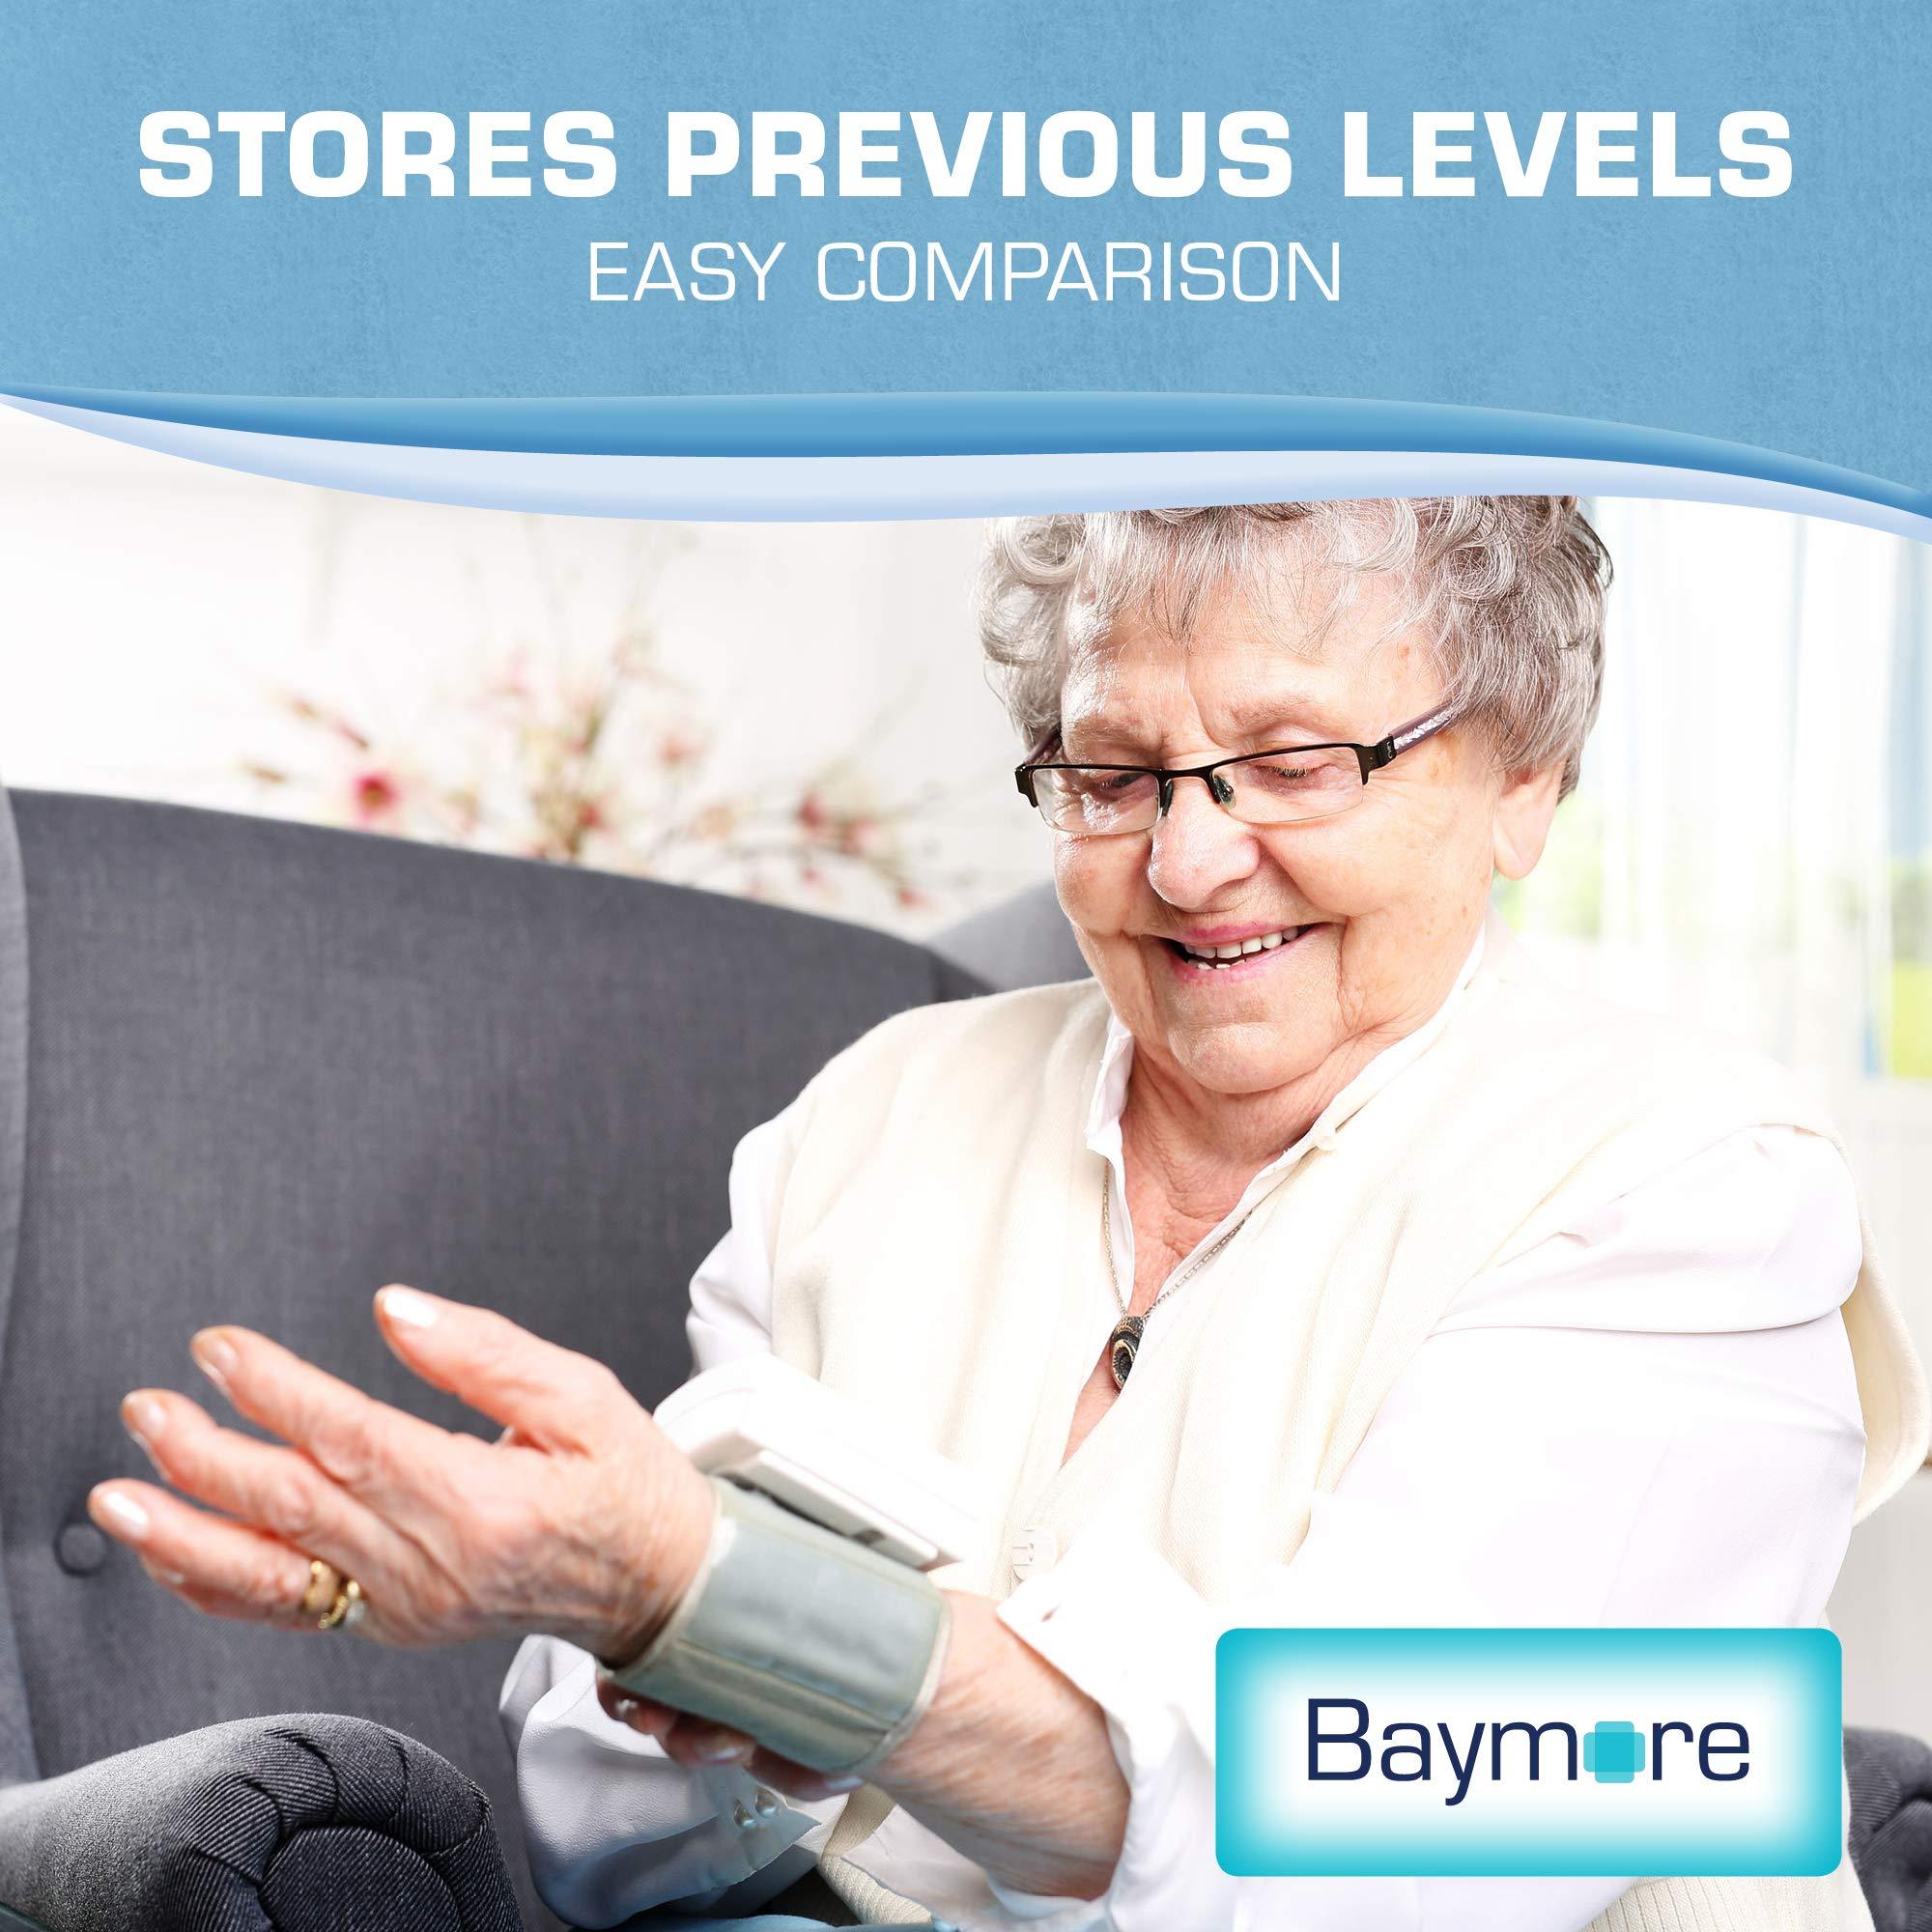 Baymore Digital Wrist Blood Pressure Monitor Cuff by Baymore (Image #5)